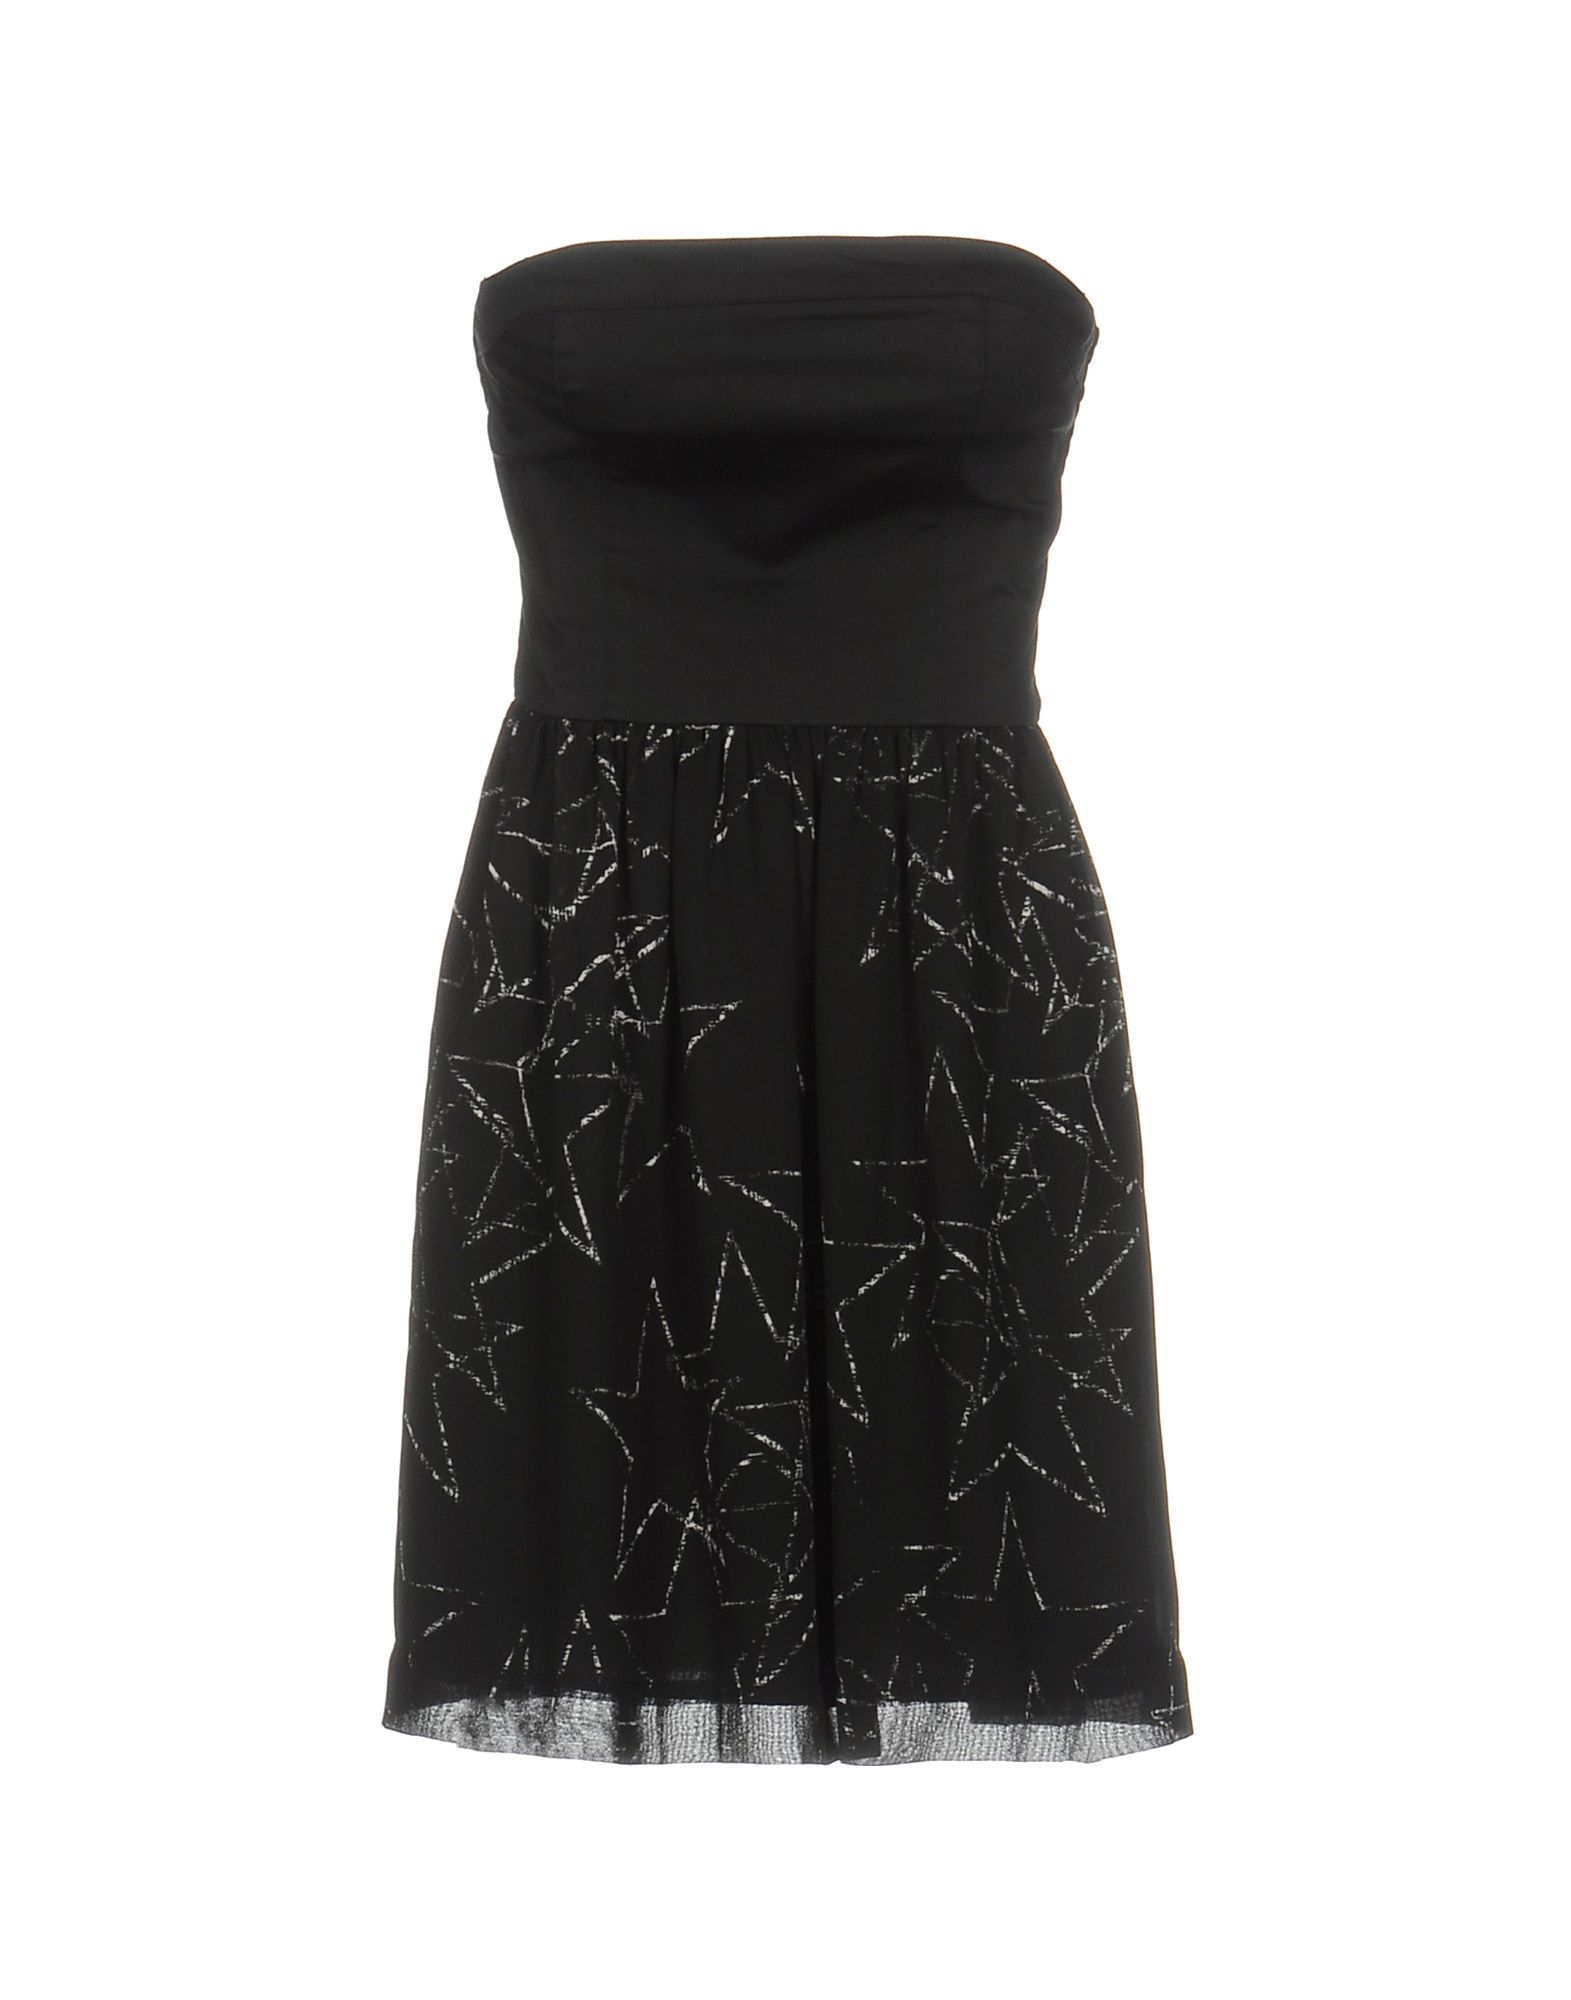 HILFIGER DENIM vs. MARVEL Короткое платье футболка hilfiger denim 1957888838 002 black iris